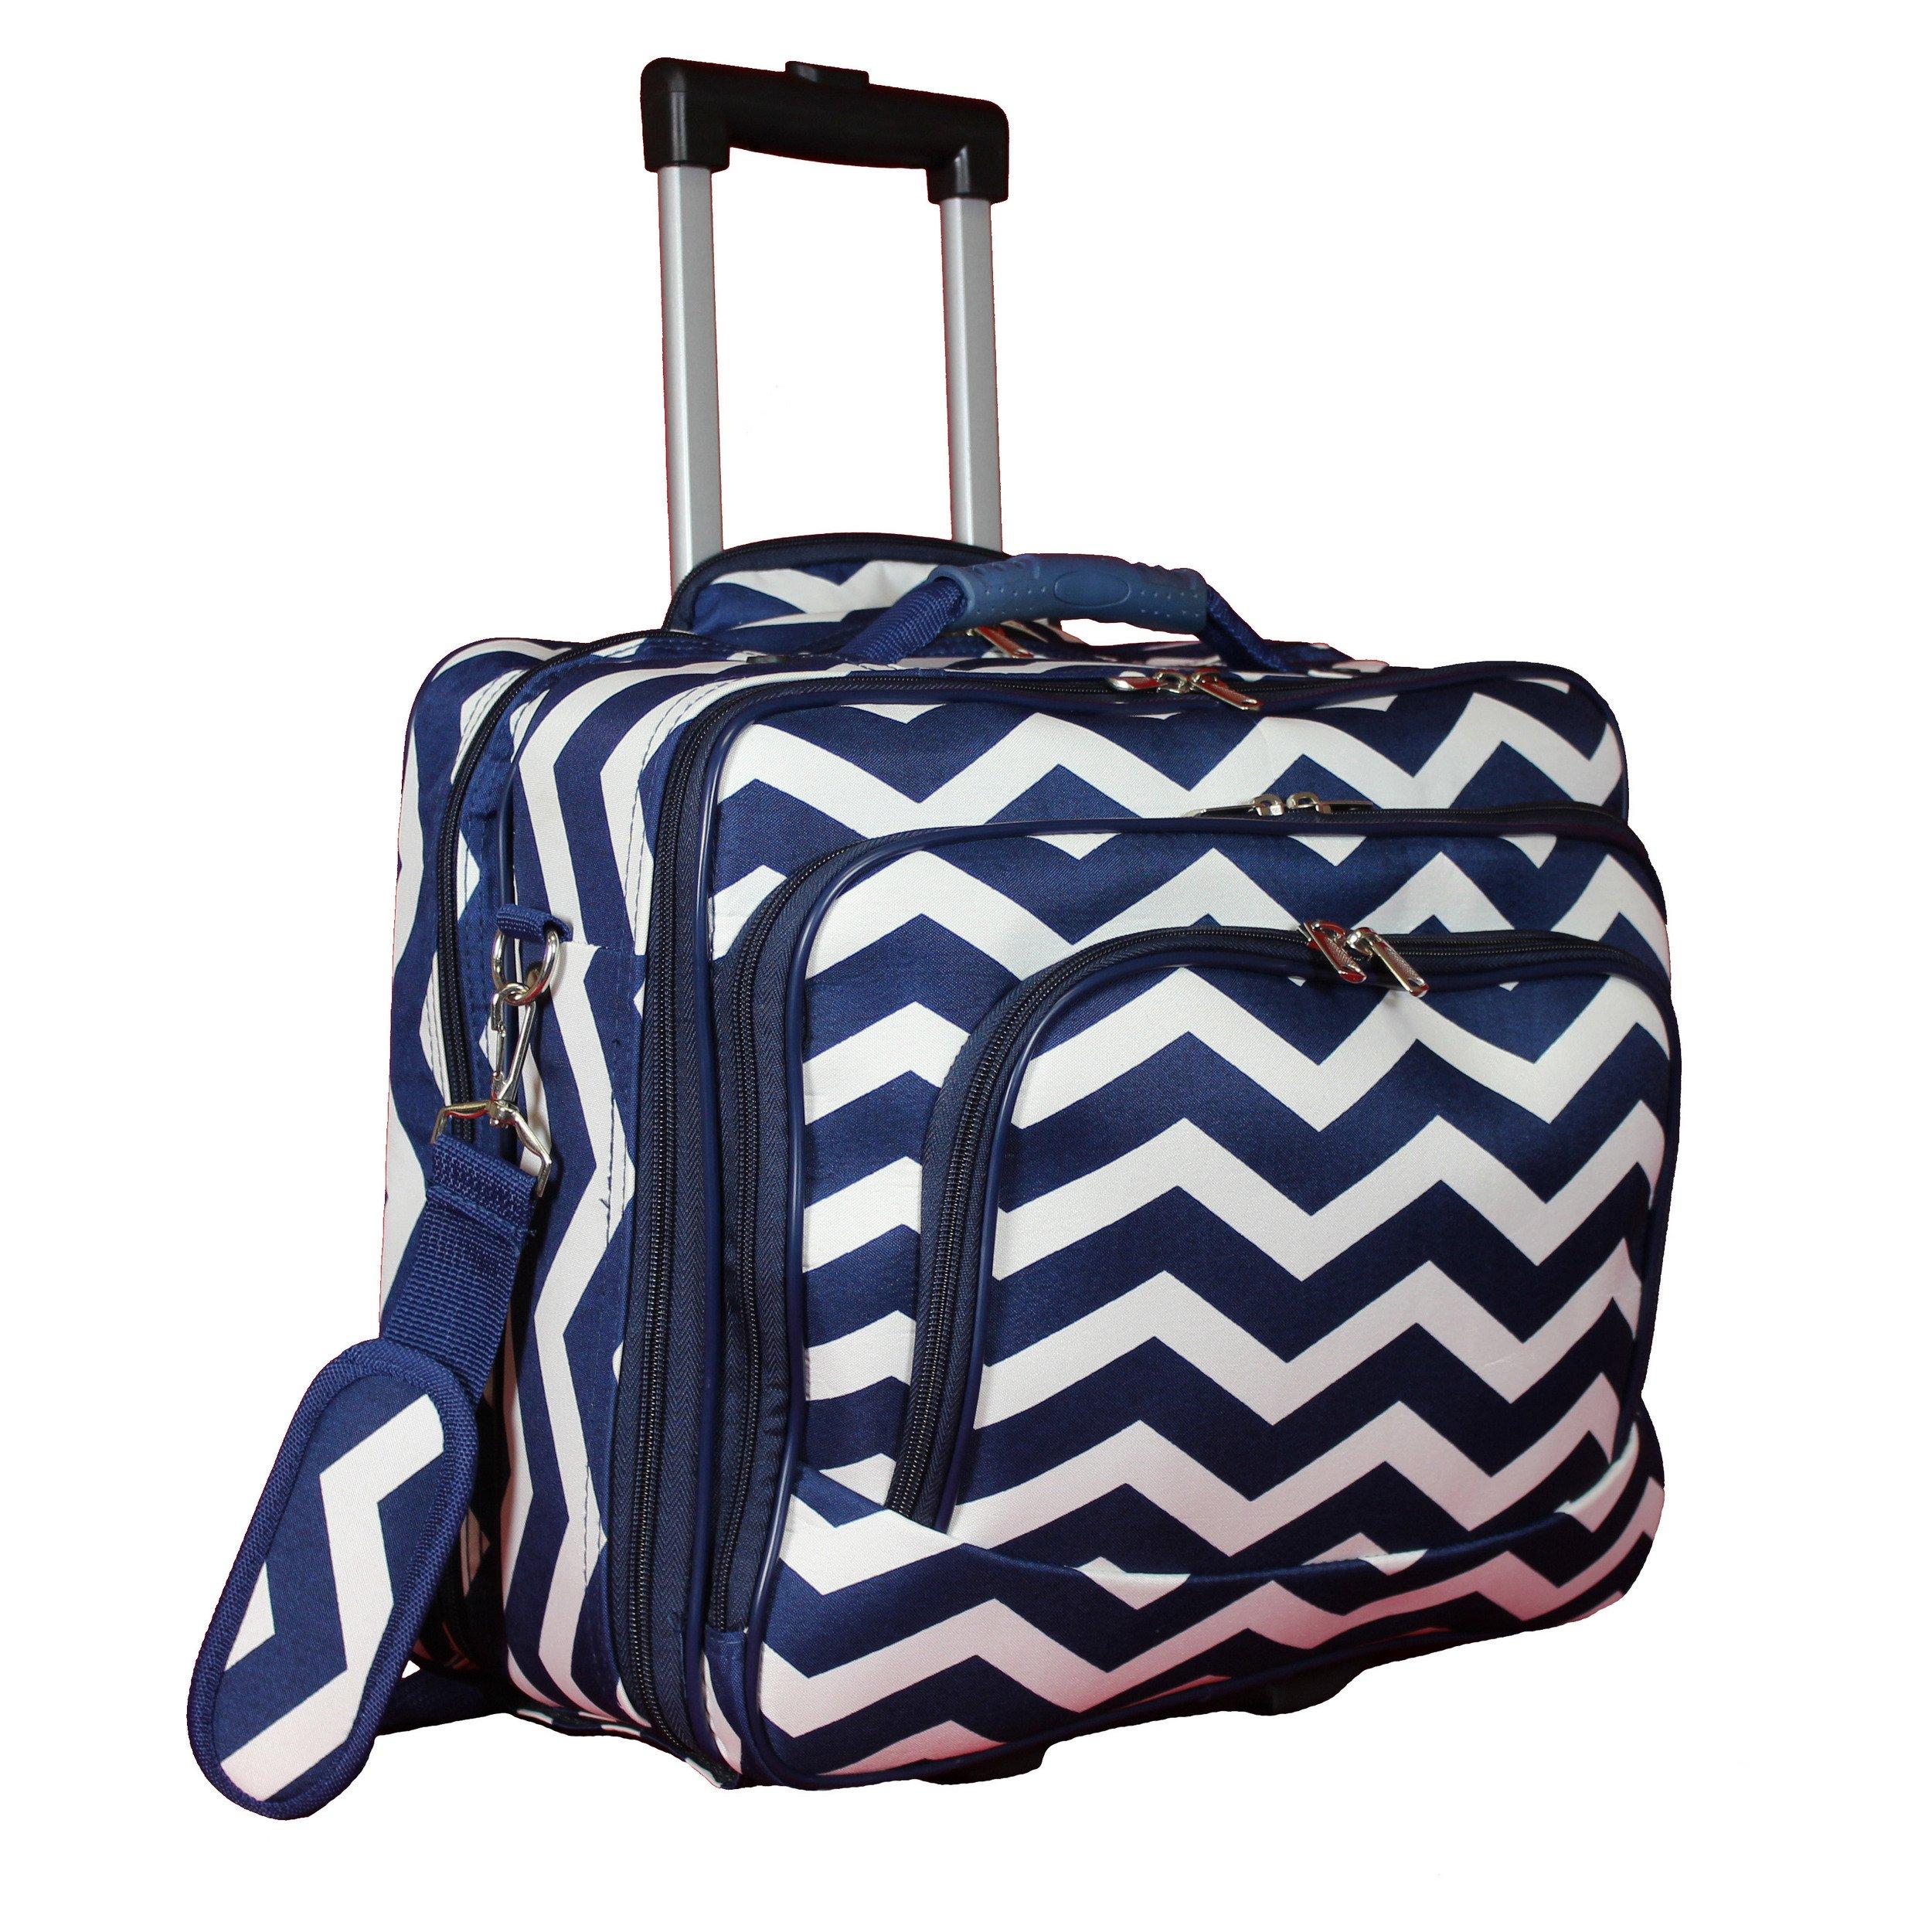 World Traveler Women's Fashion Print Rolling 17'' Case Laptop Bag, Navy White Chevron, One Size